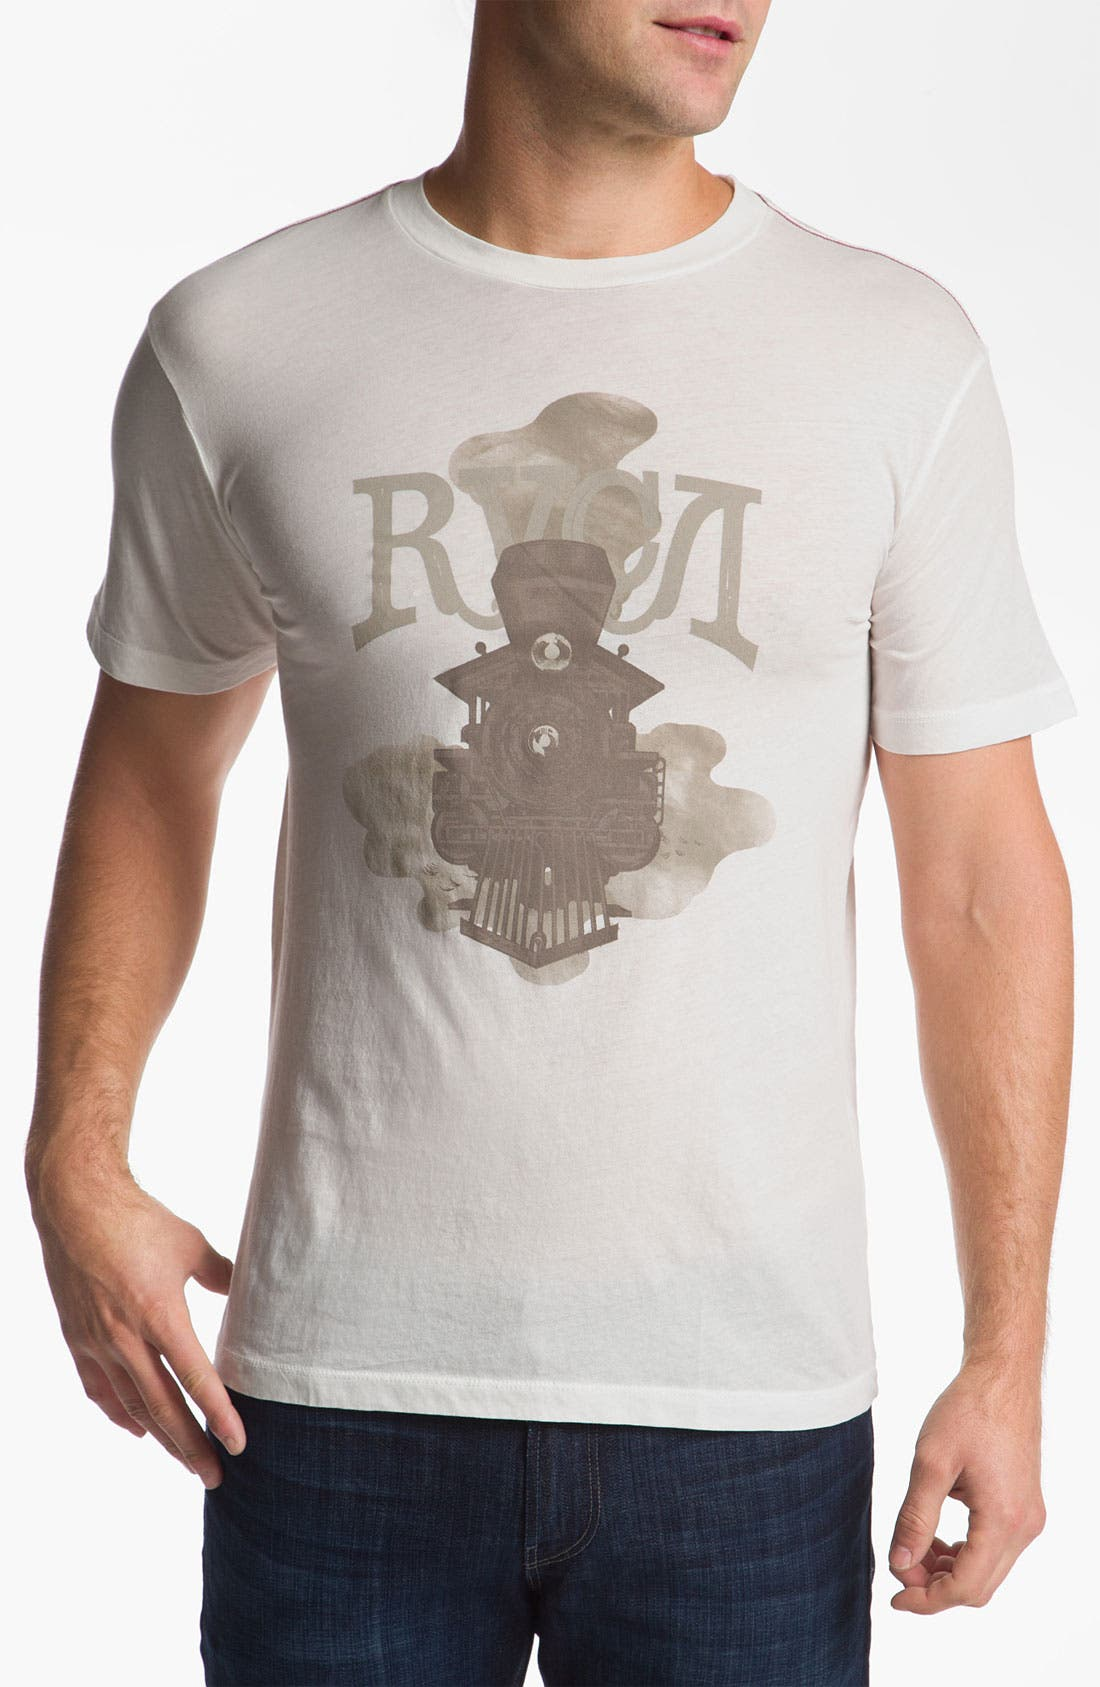 Main Image - RVCA 'Locomotive' Vintage Wash T-Shirt